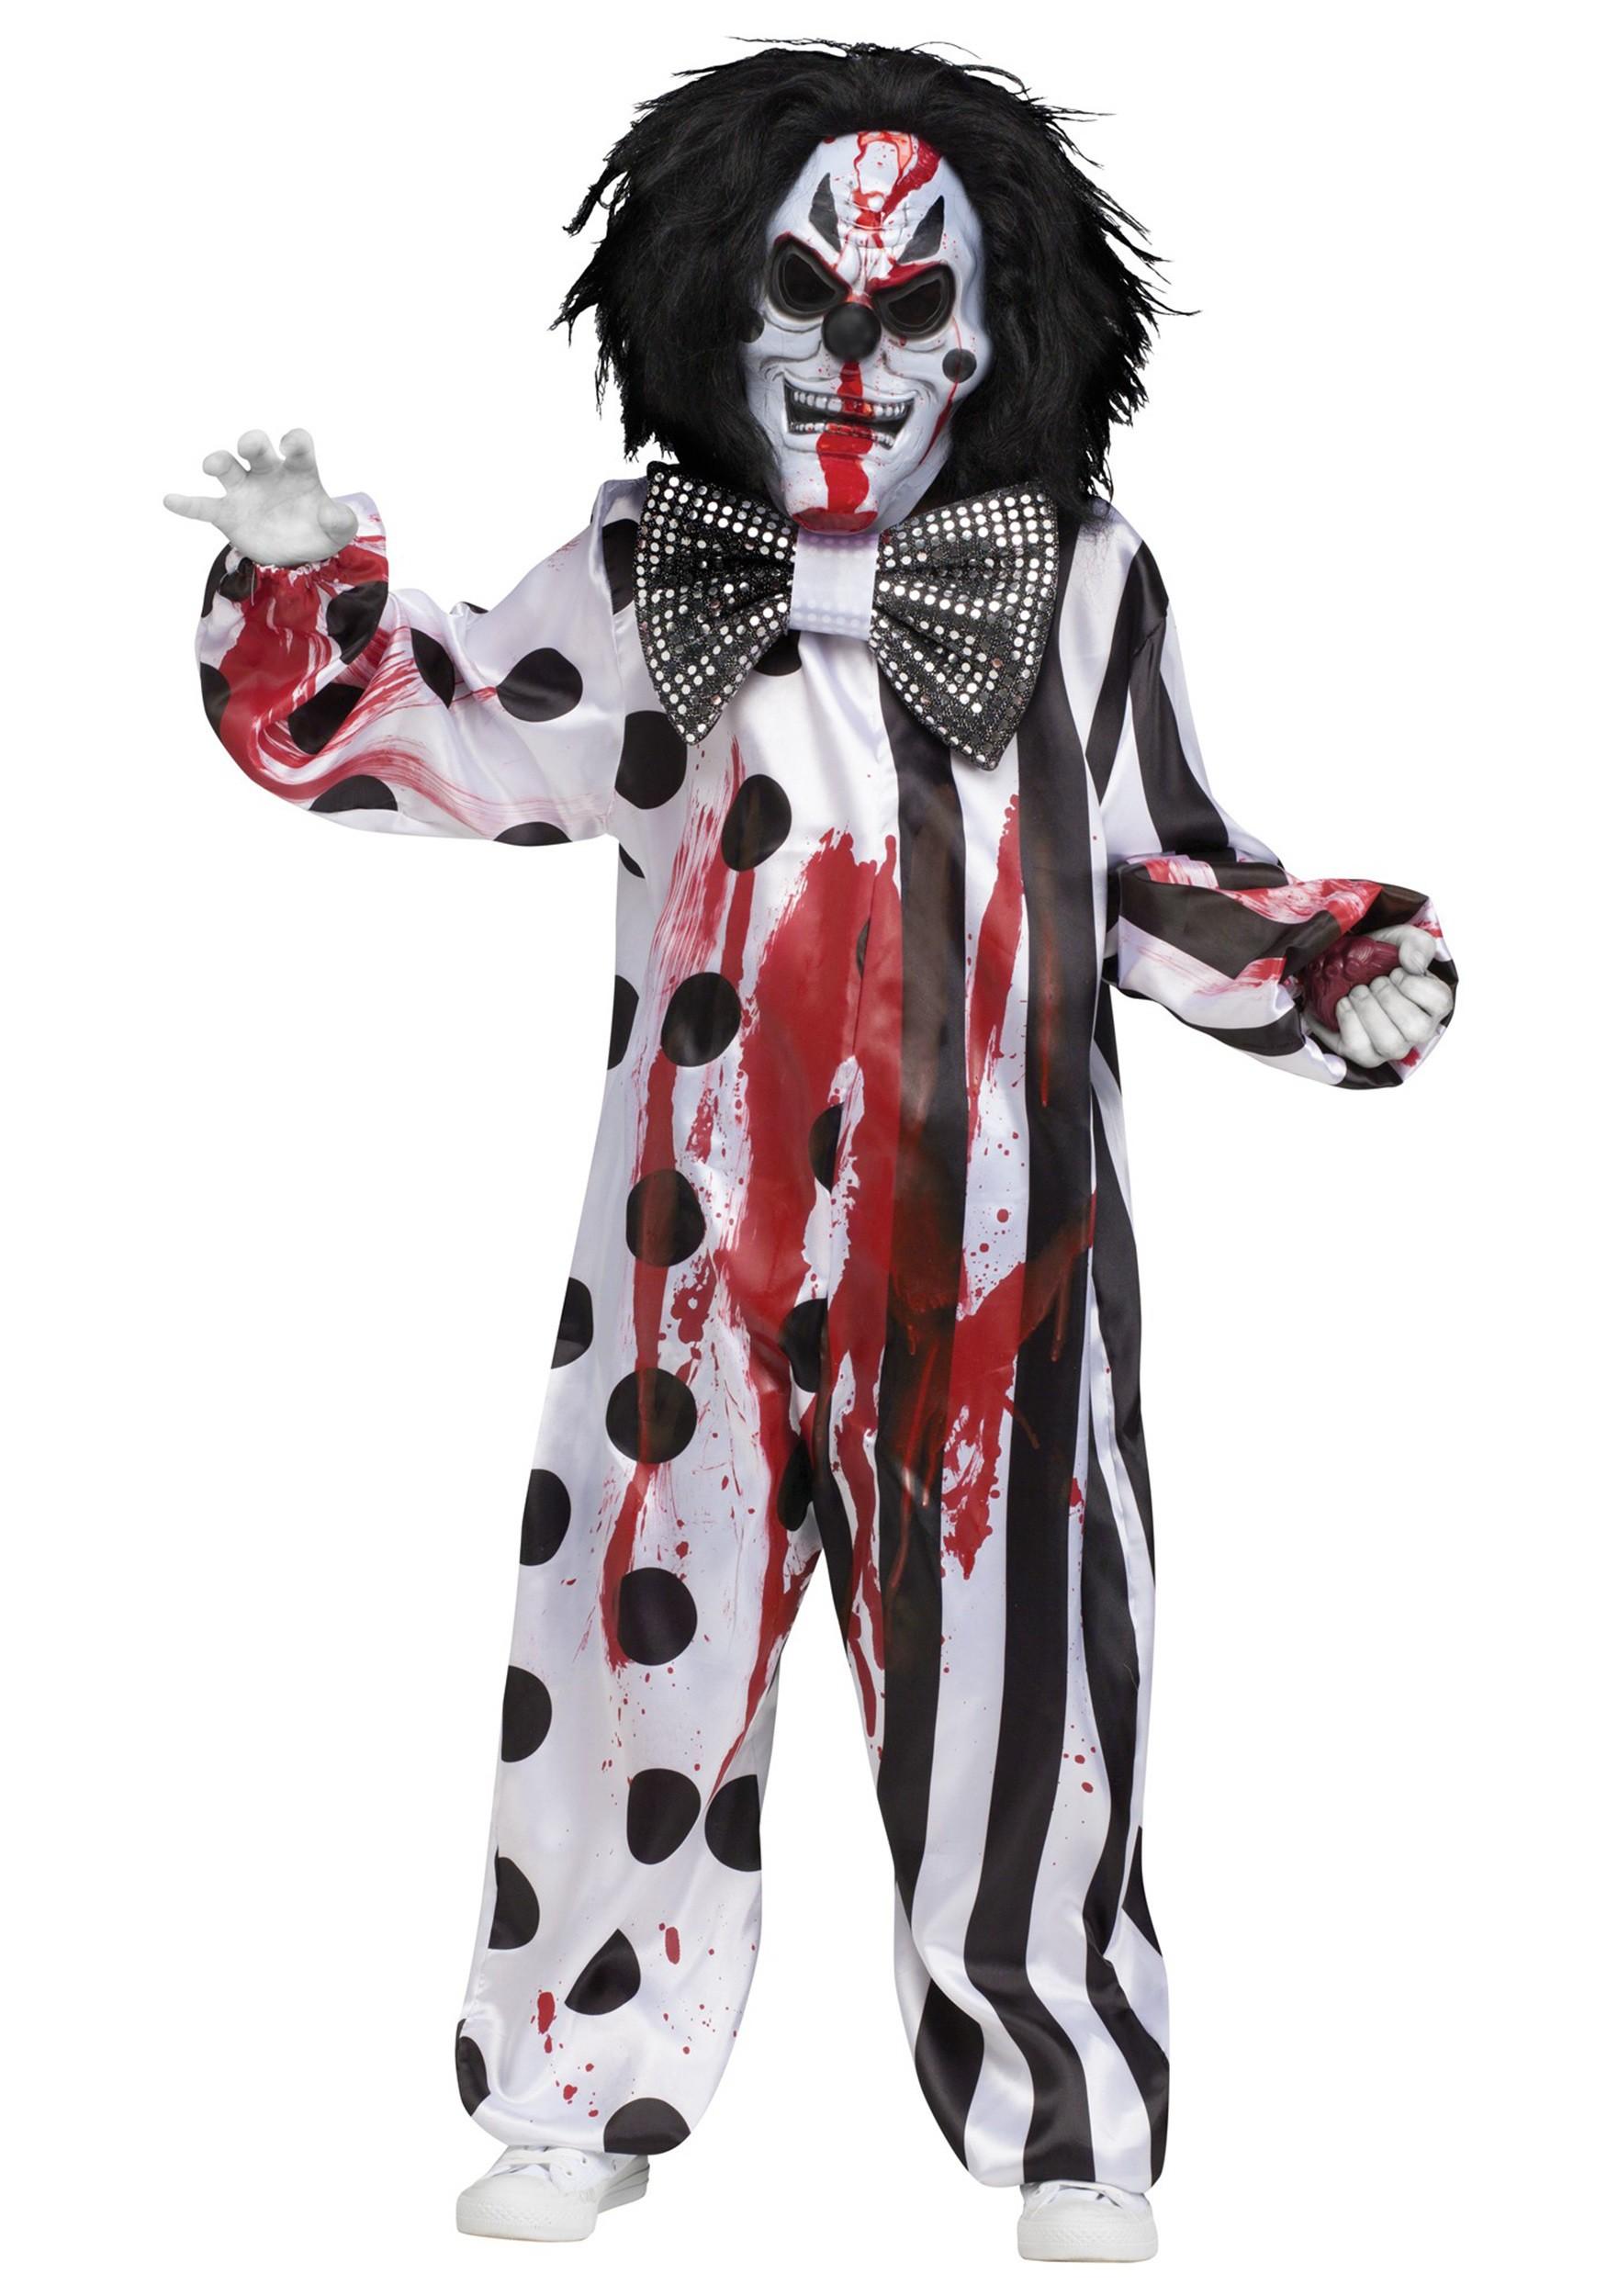 Child Bleeding Killer Clown Costume  sc 1 st  Fun.com & Bleeding Killer Clown Costume